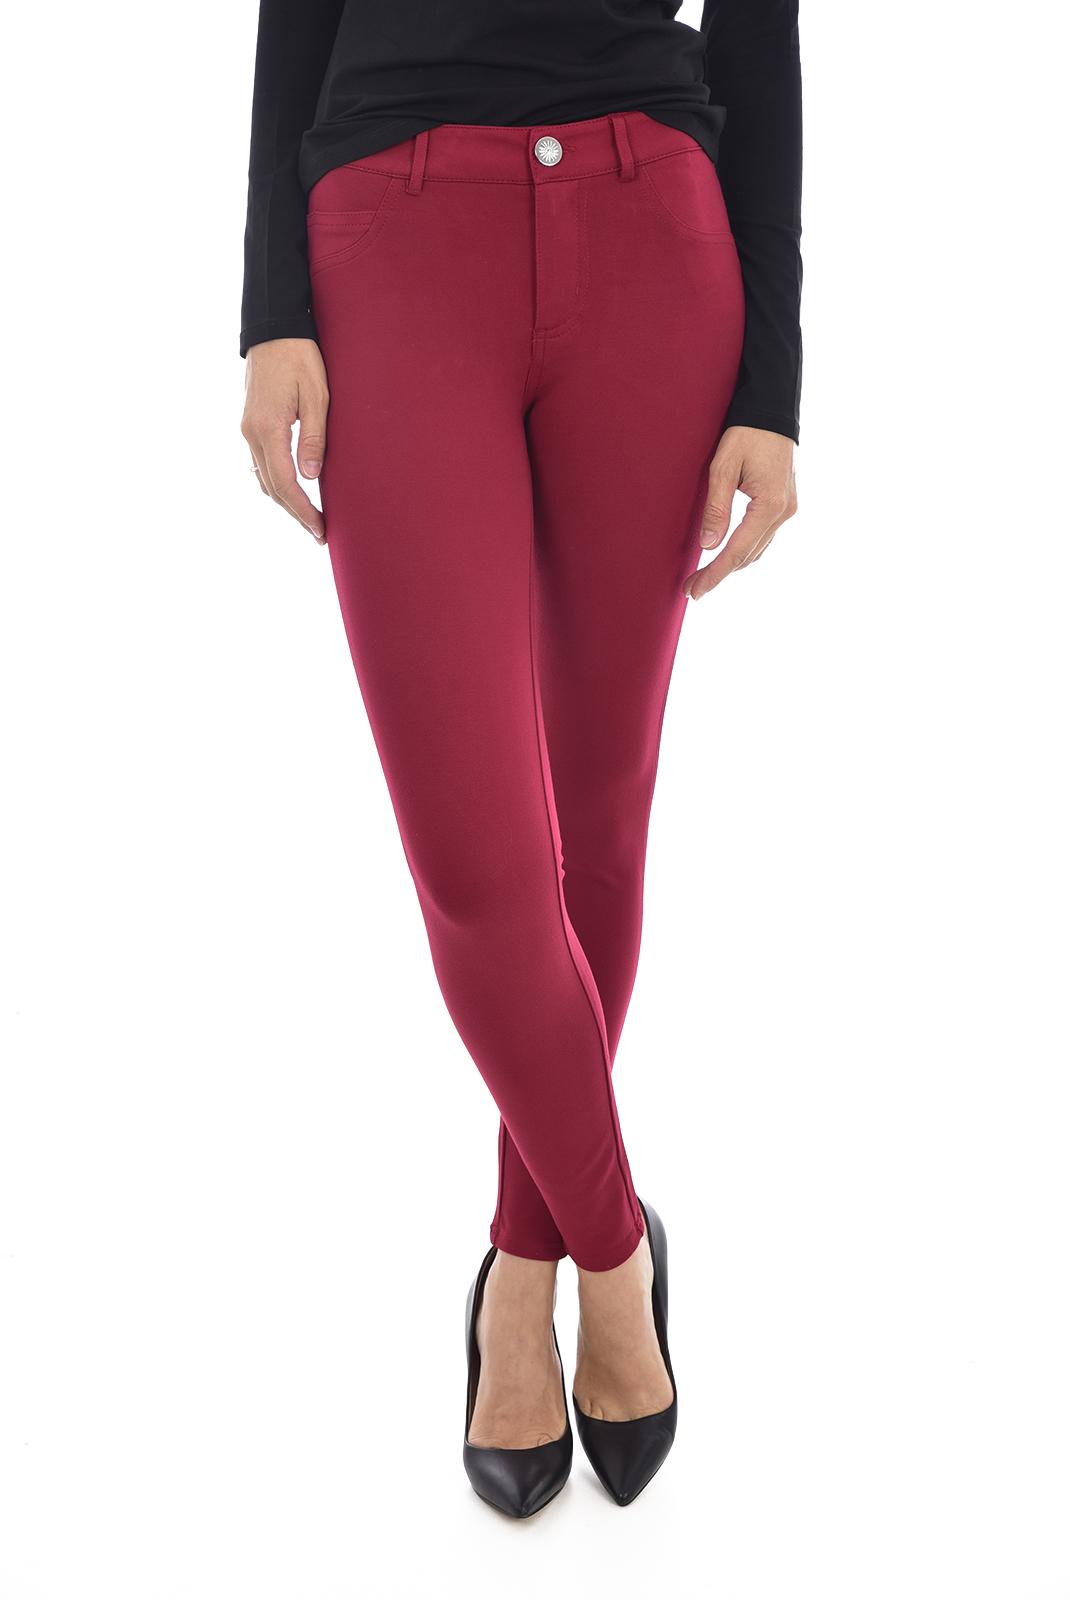 Pantalons  Guess jeans W94AJ2 K8RN0 curve x RUSSIAN RED